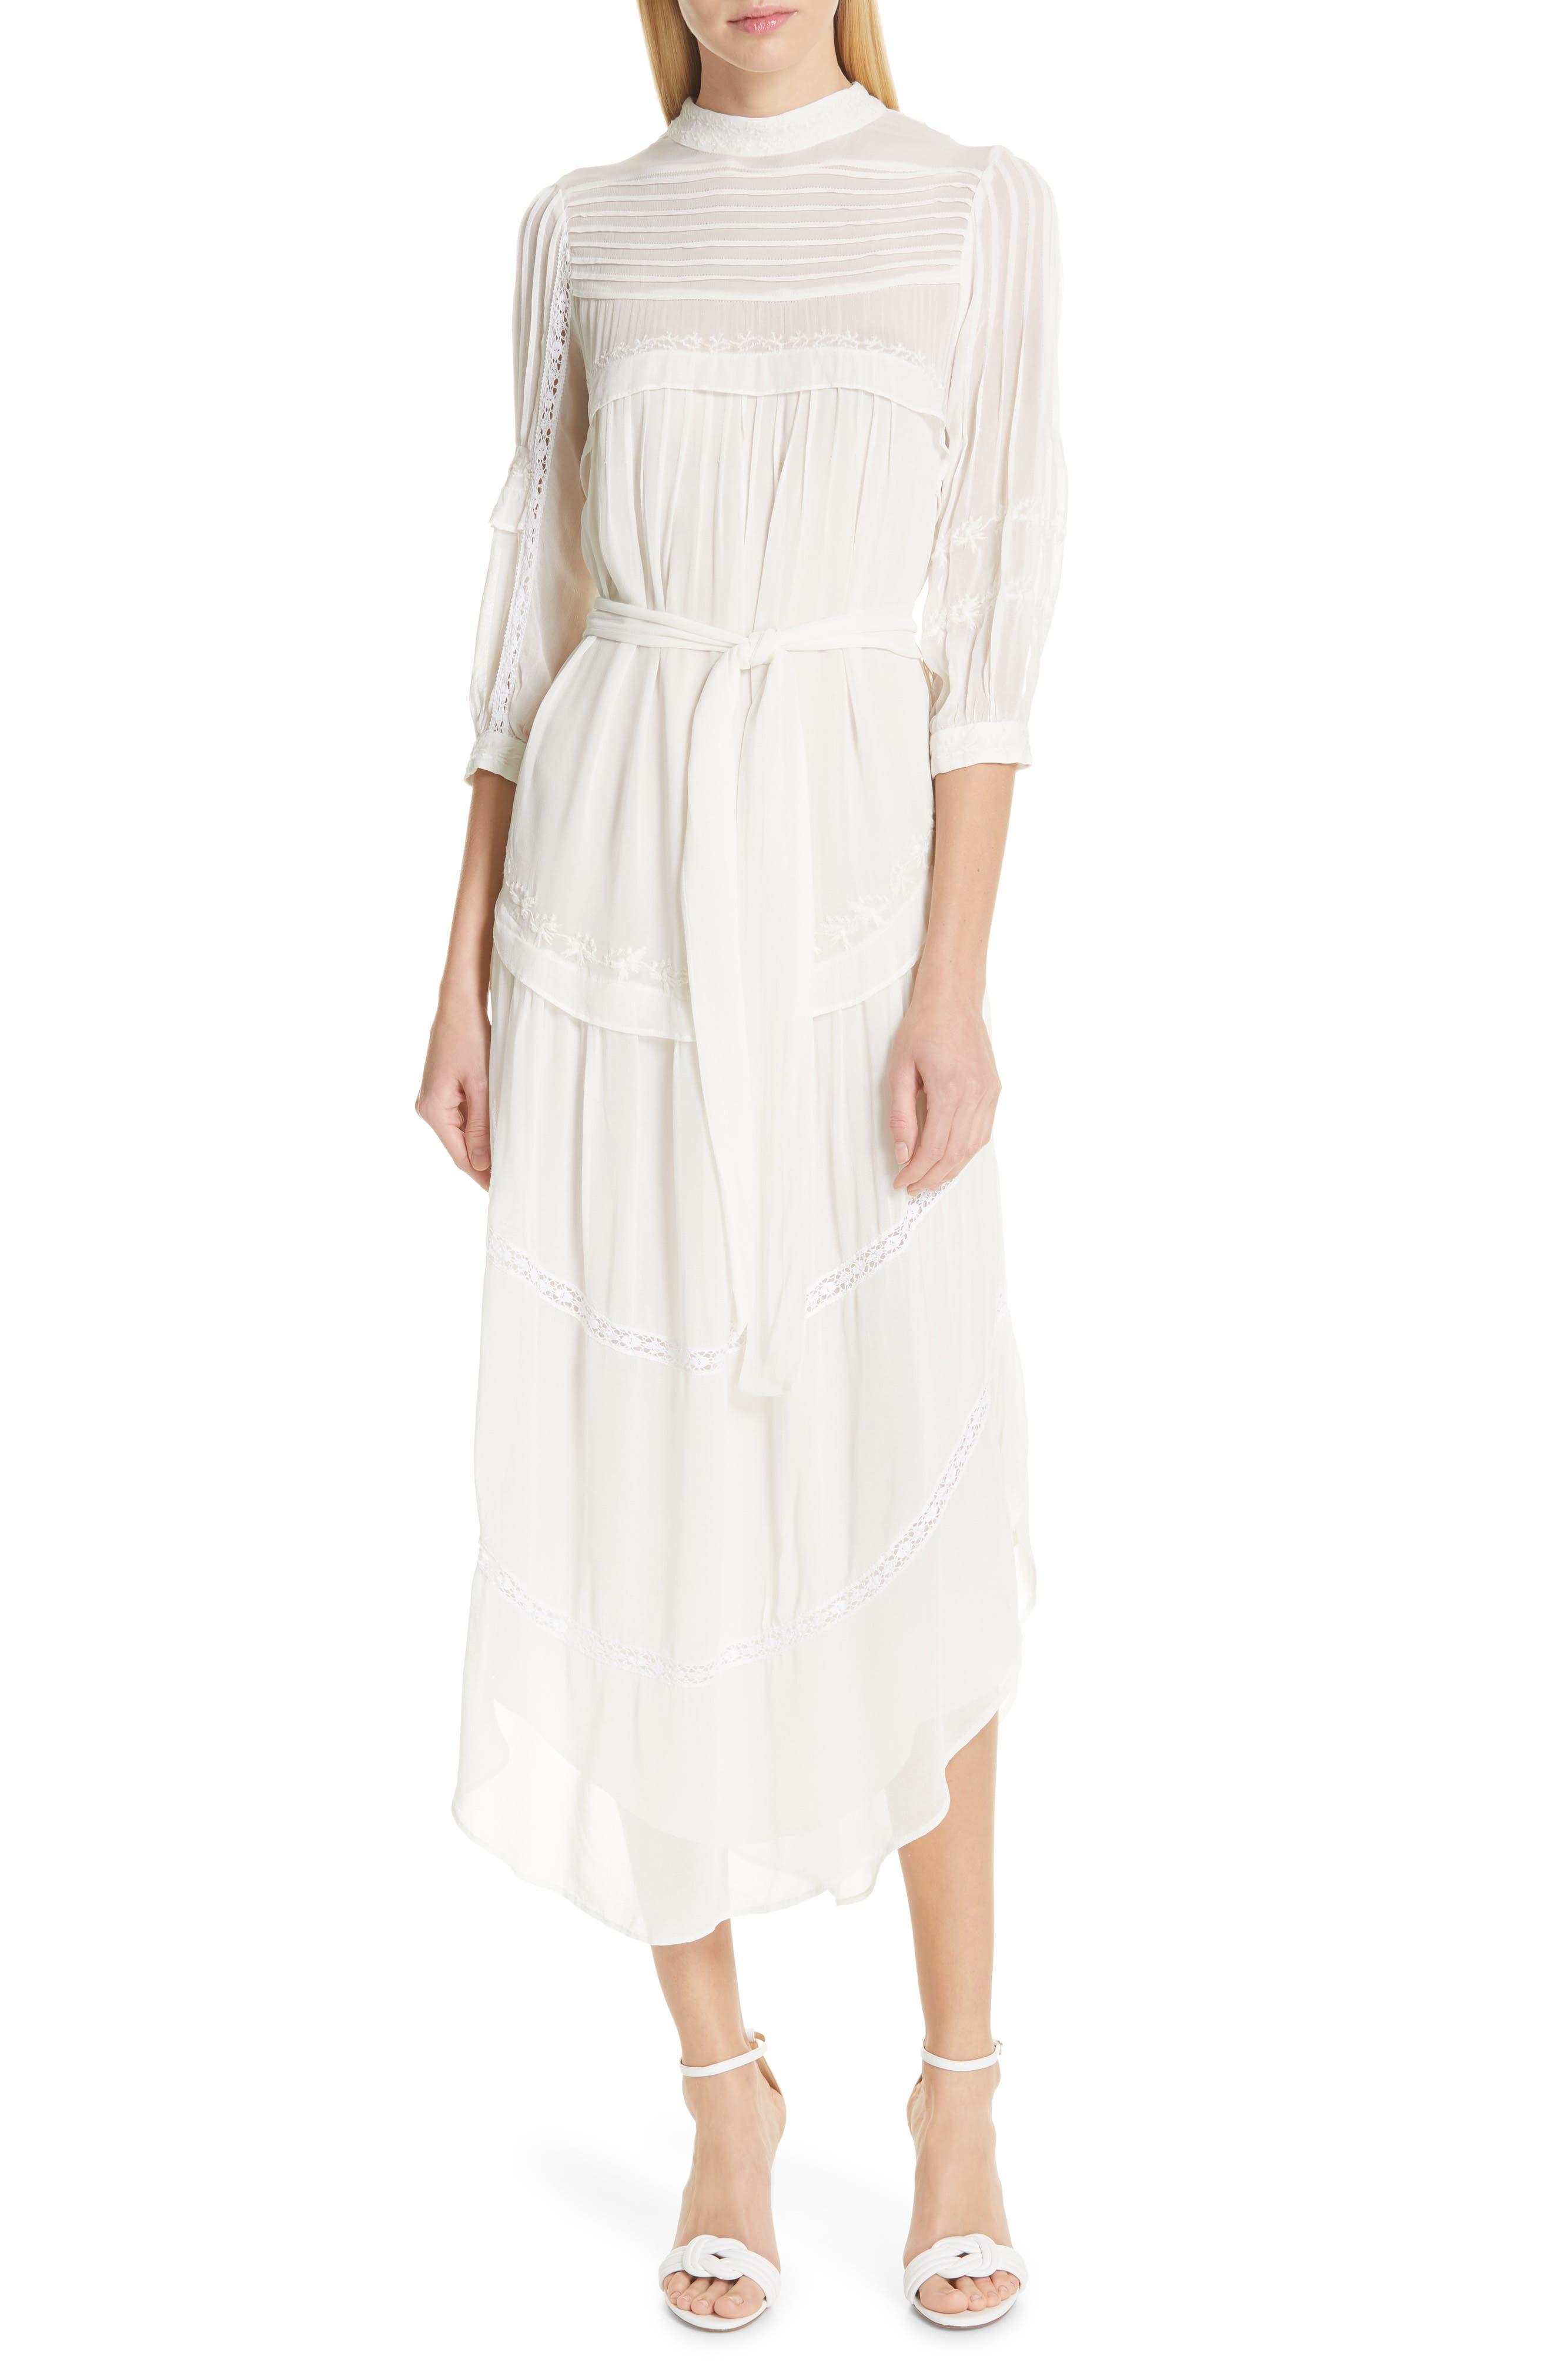 Ba & sh Prune Midi Dress, Ivory